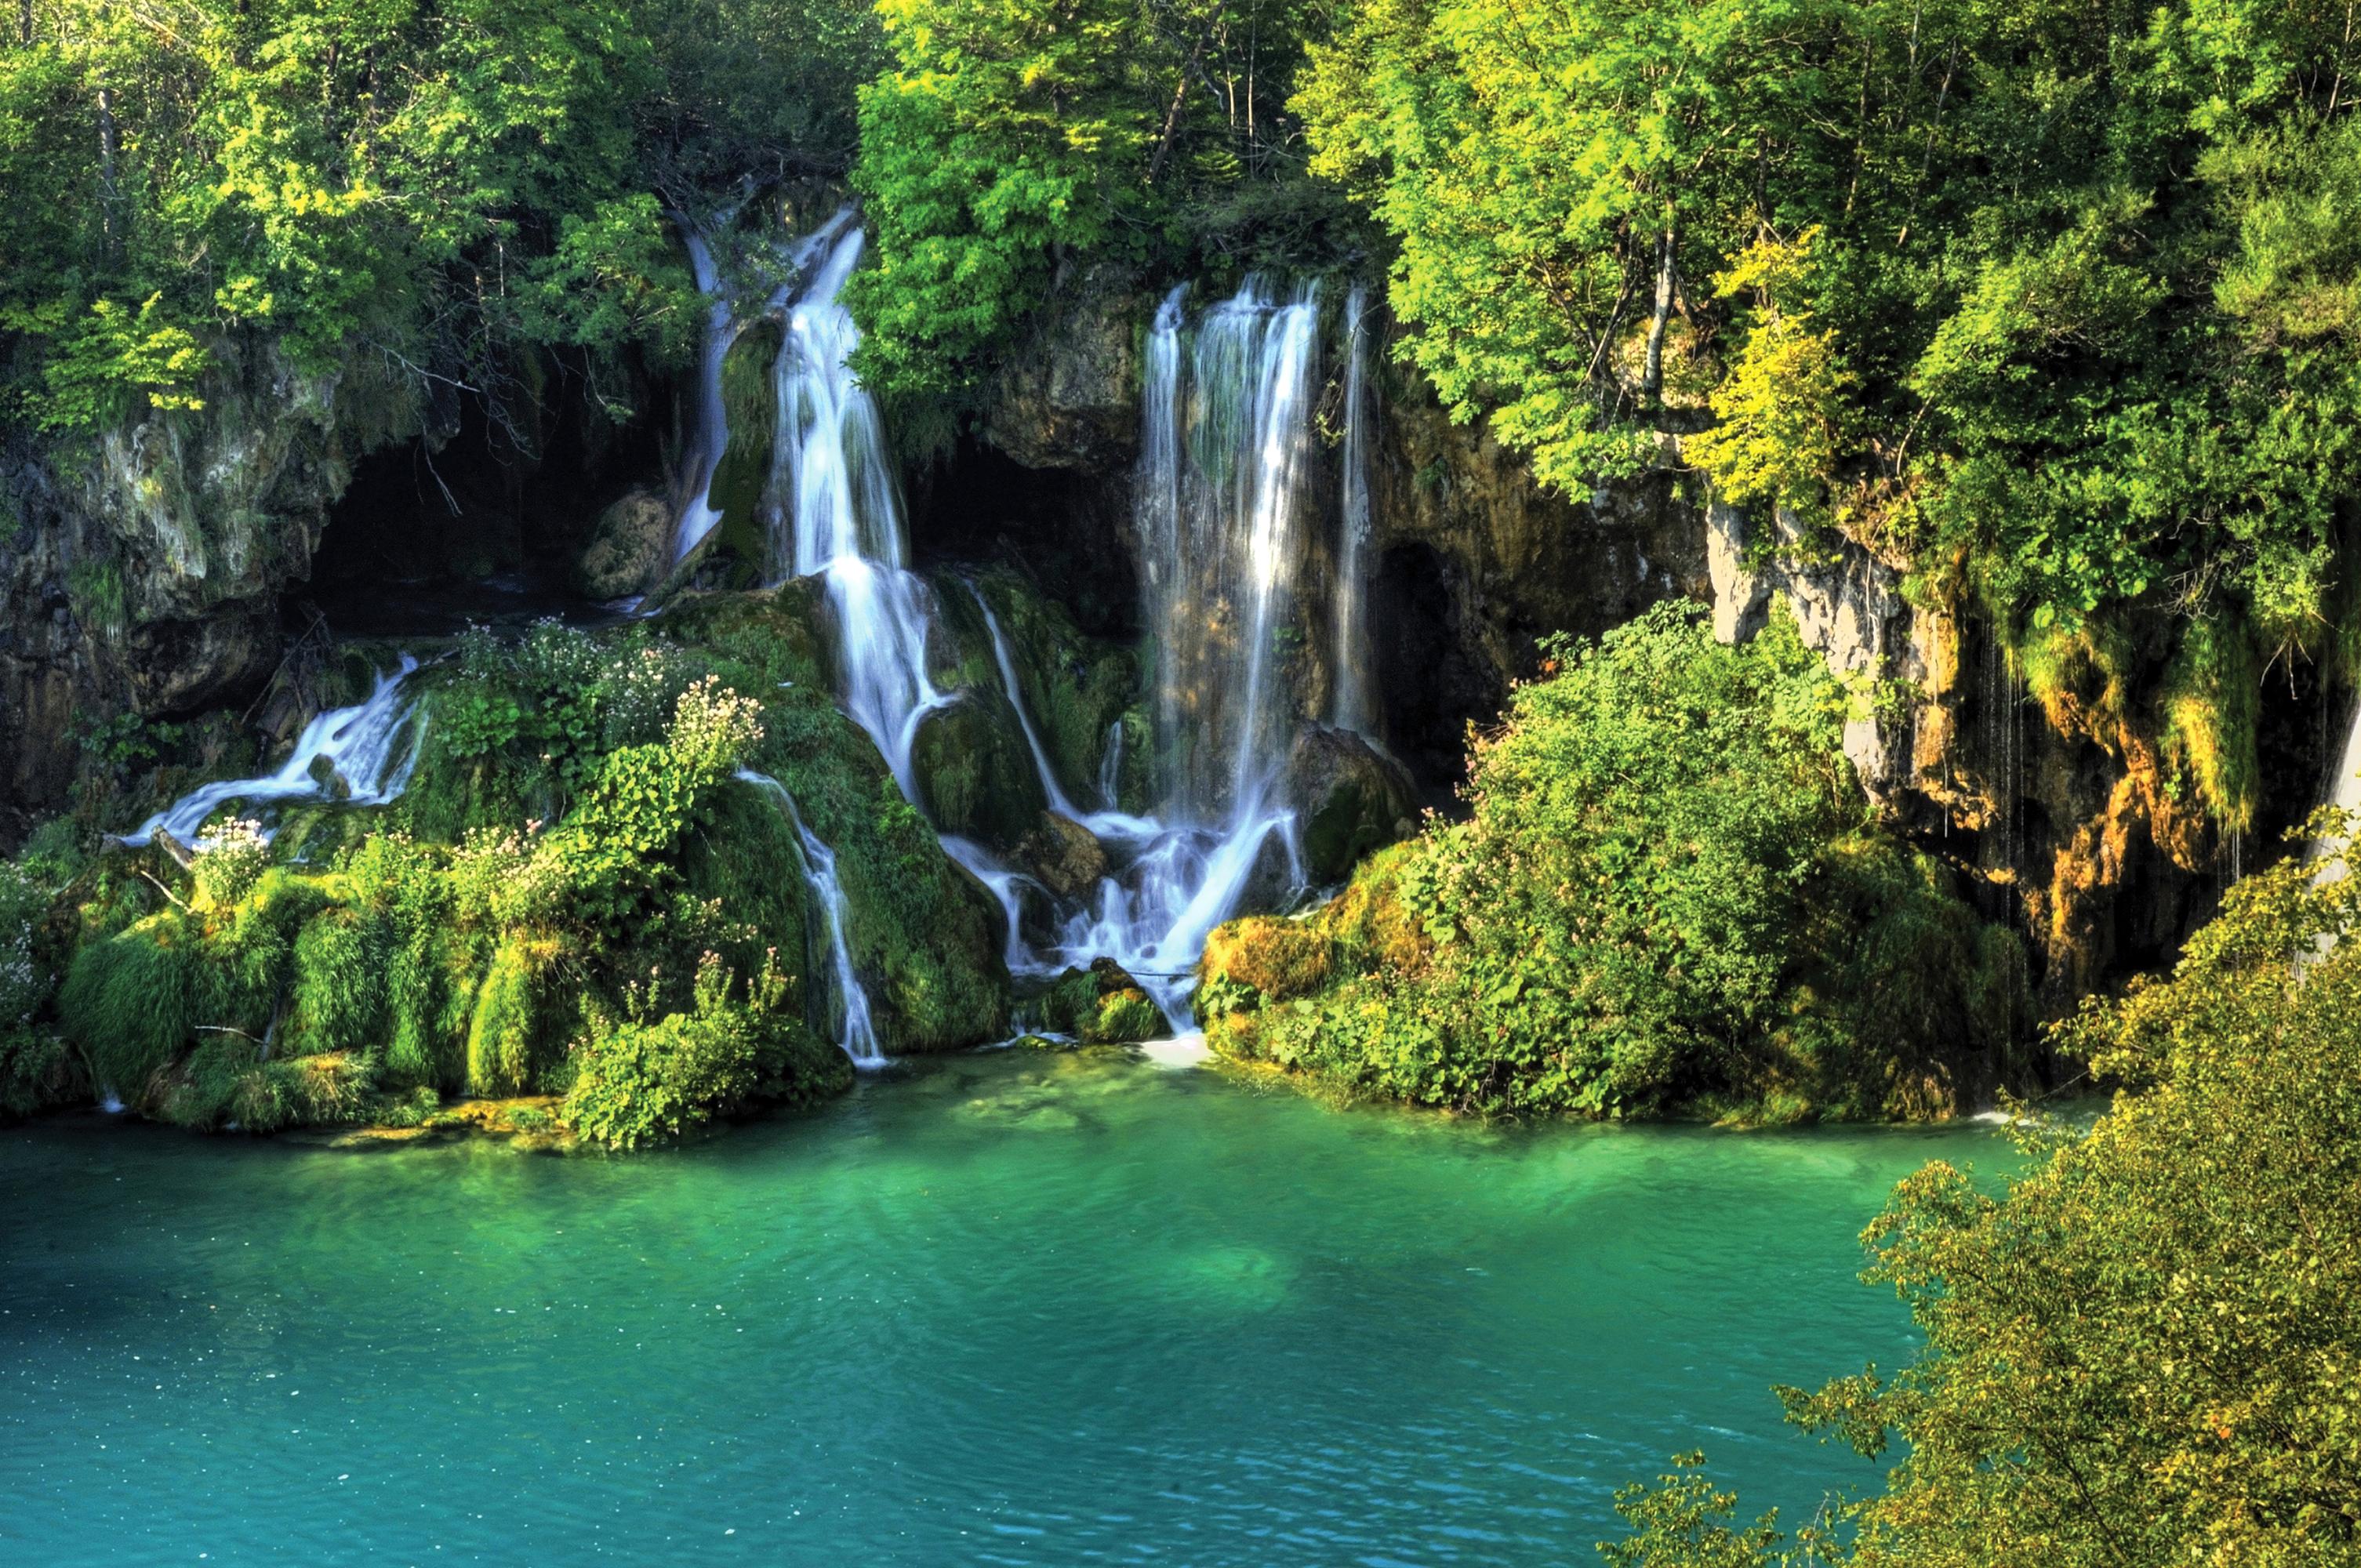 3011x2000 Tailandia Parque Cascadas Erawan waterfall Musgo parques, salto de agua Naturaleza